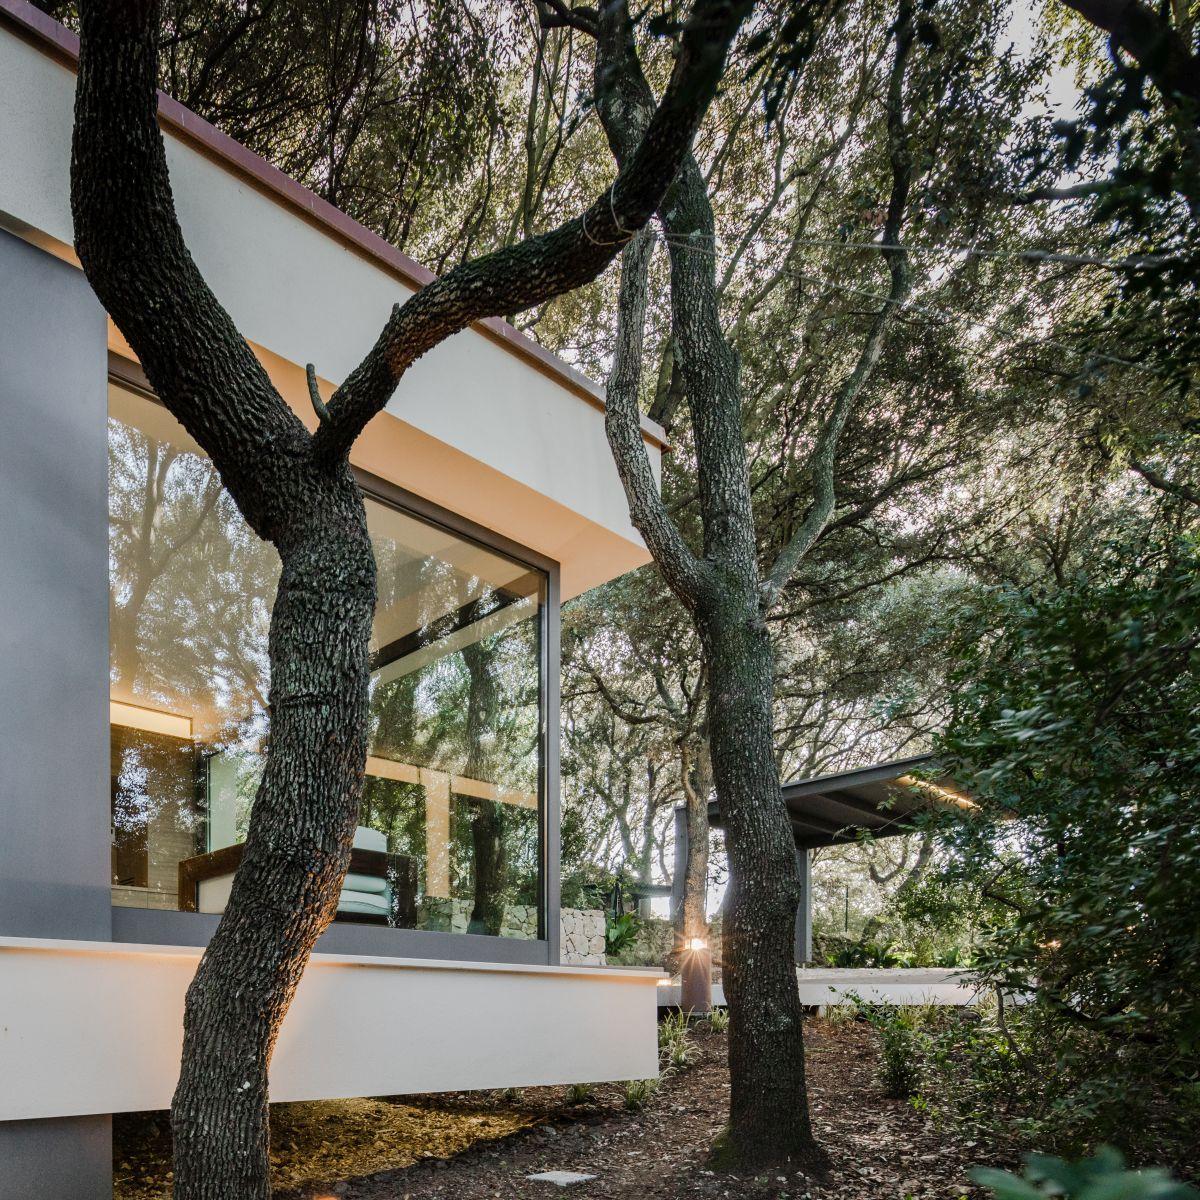 Casa nel Bosco extension for main house